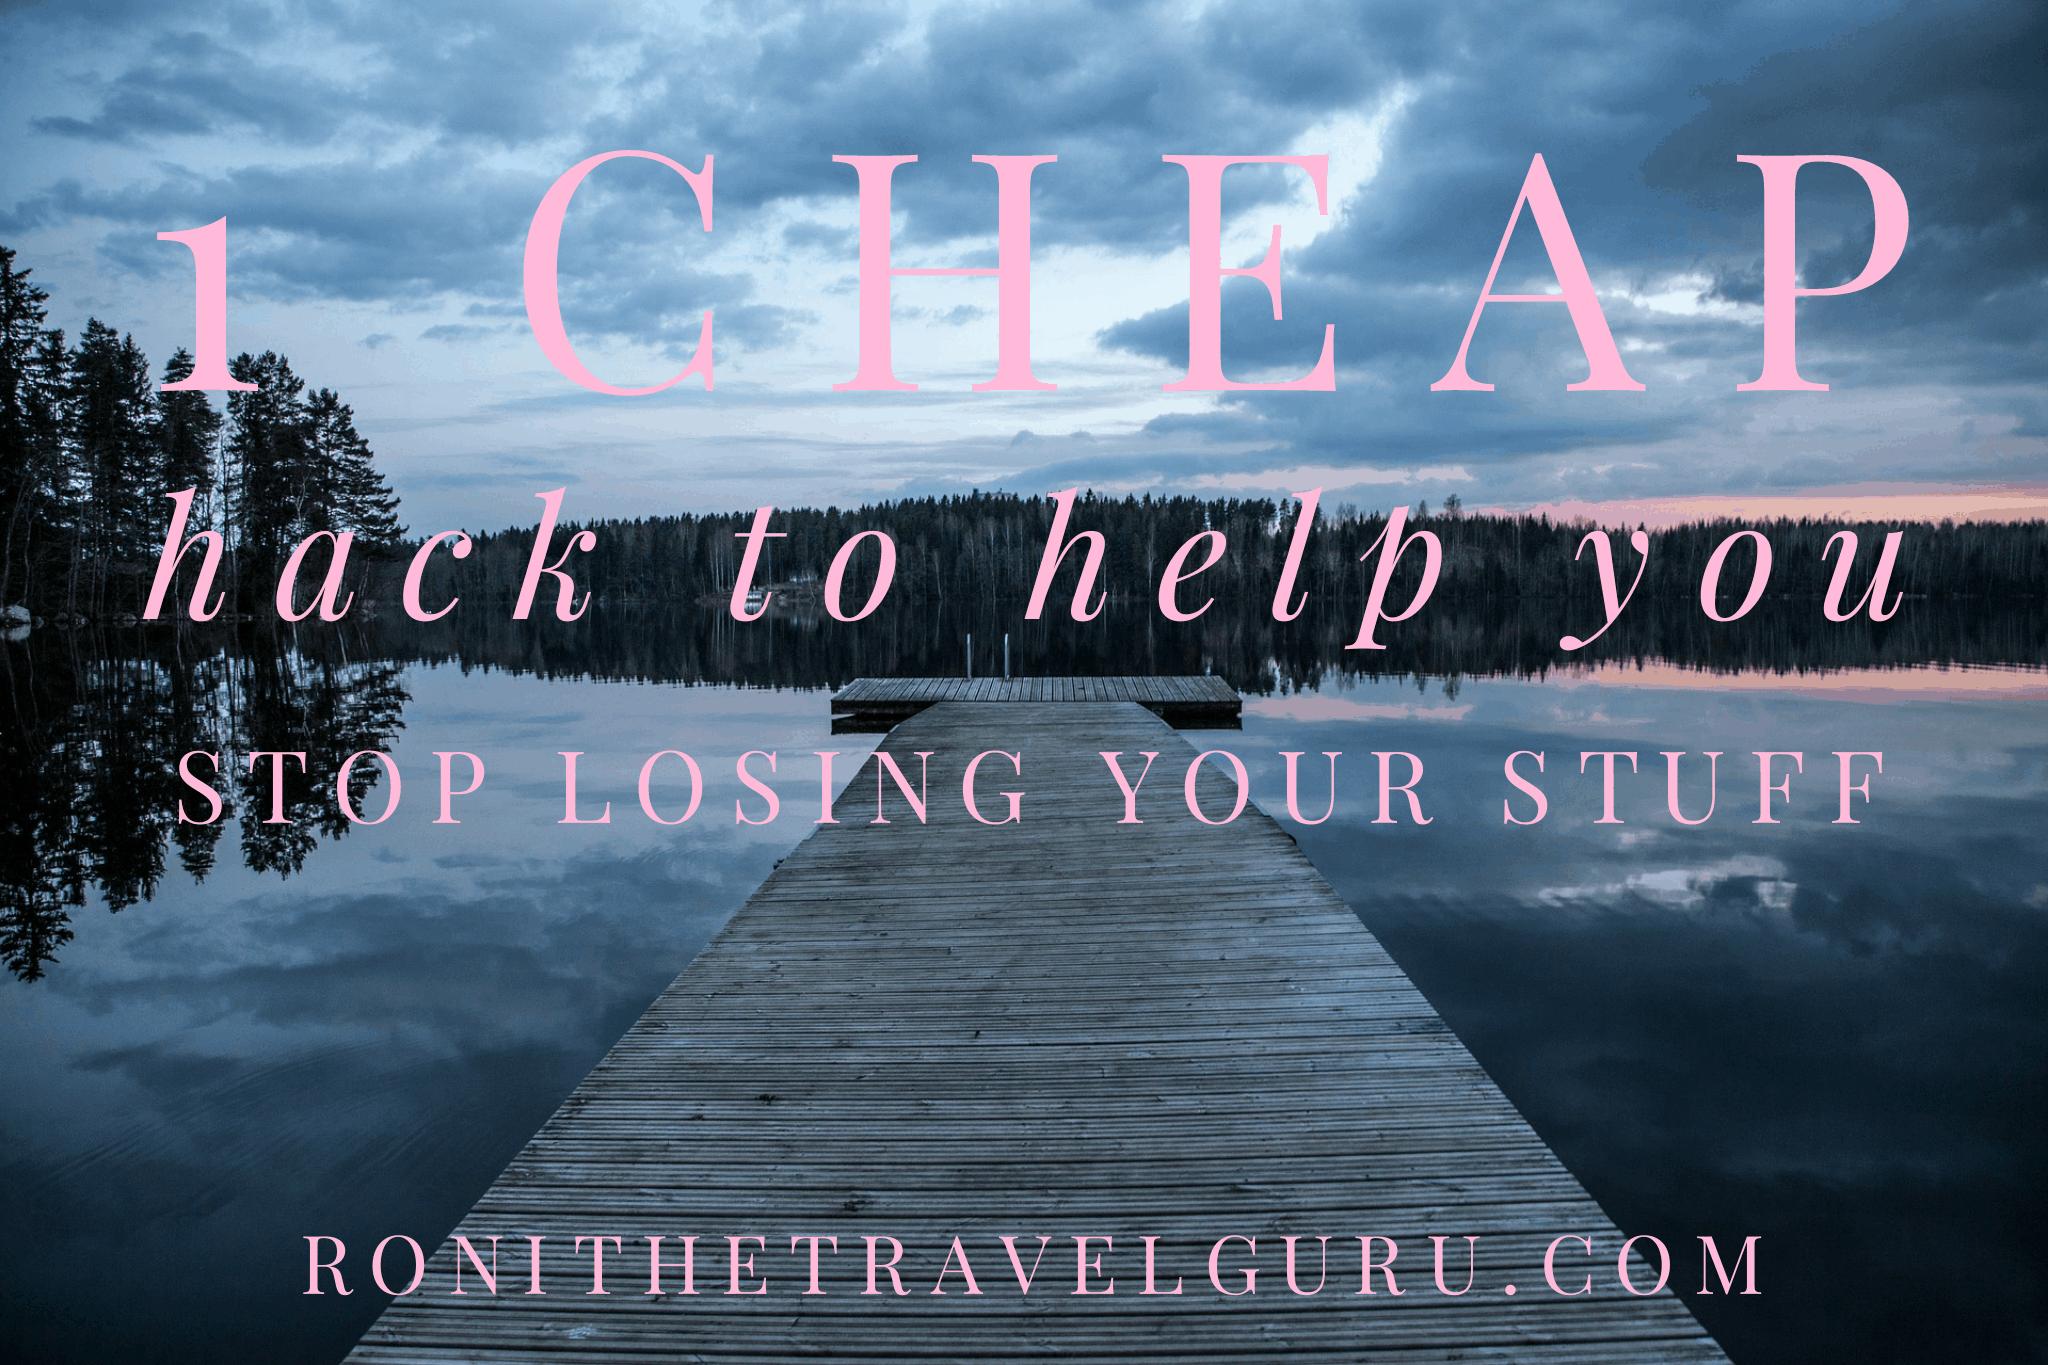 stop losing stuff traveling